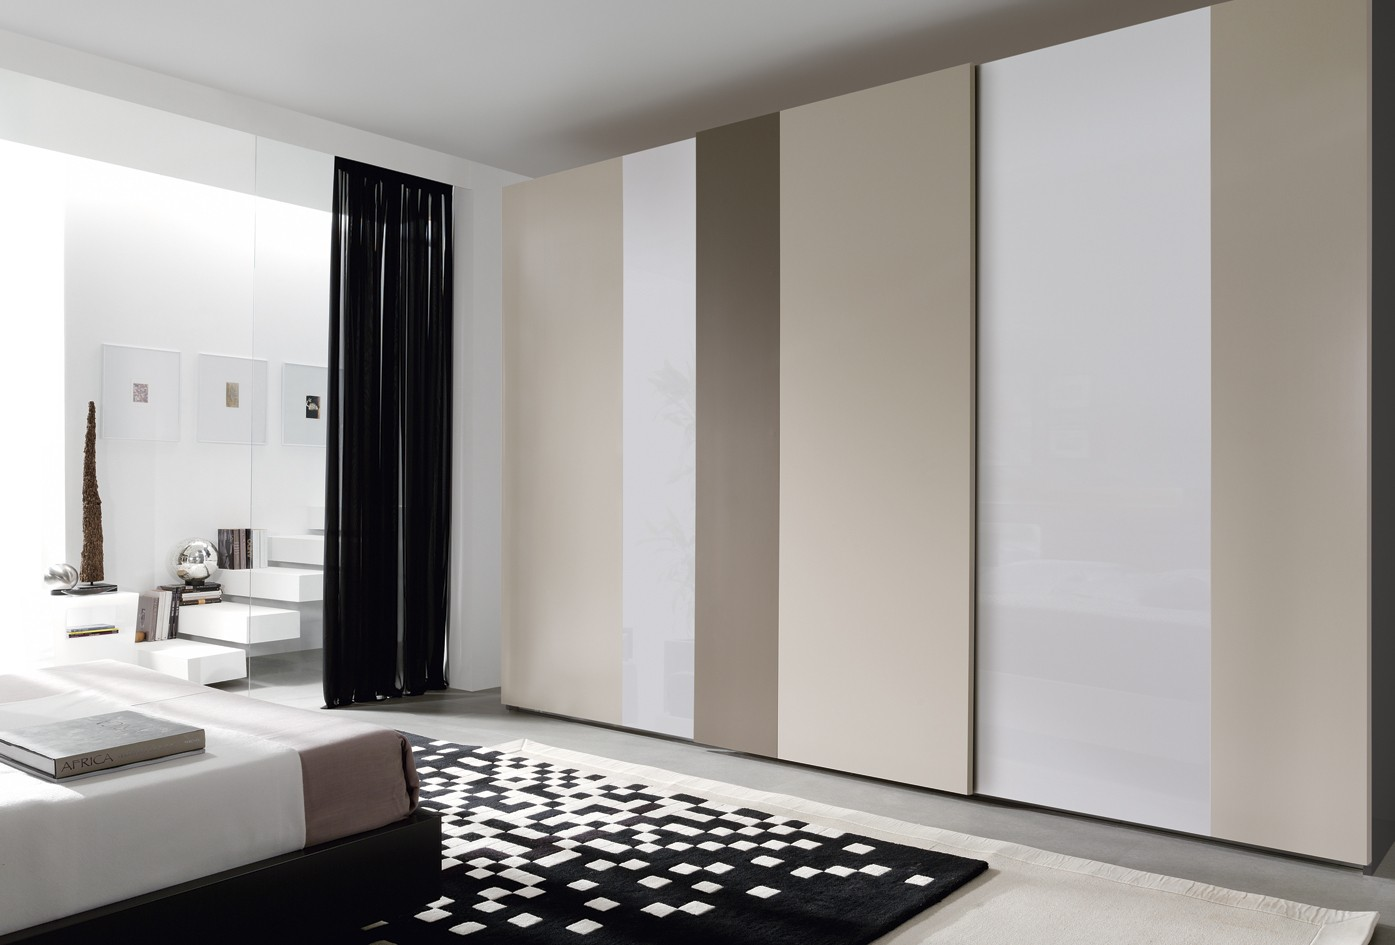 Imagenes armarios modernos nexo de piferrer built de moblec living de garcia sabat - Ajustar puertas armario ...